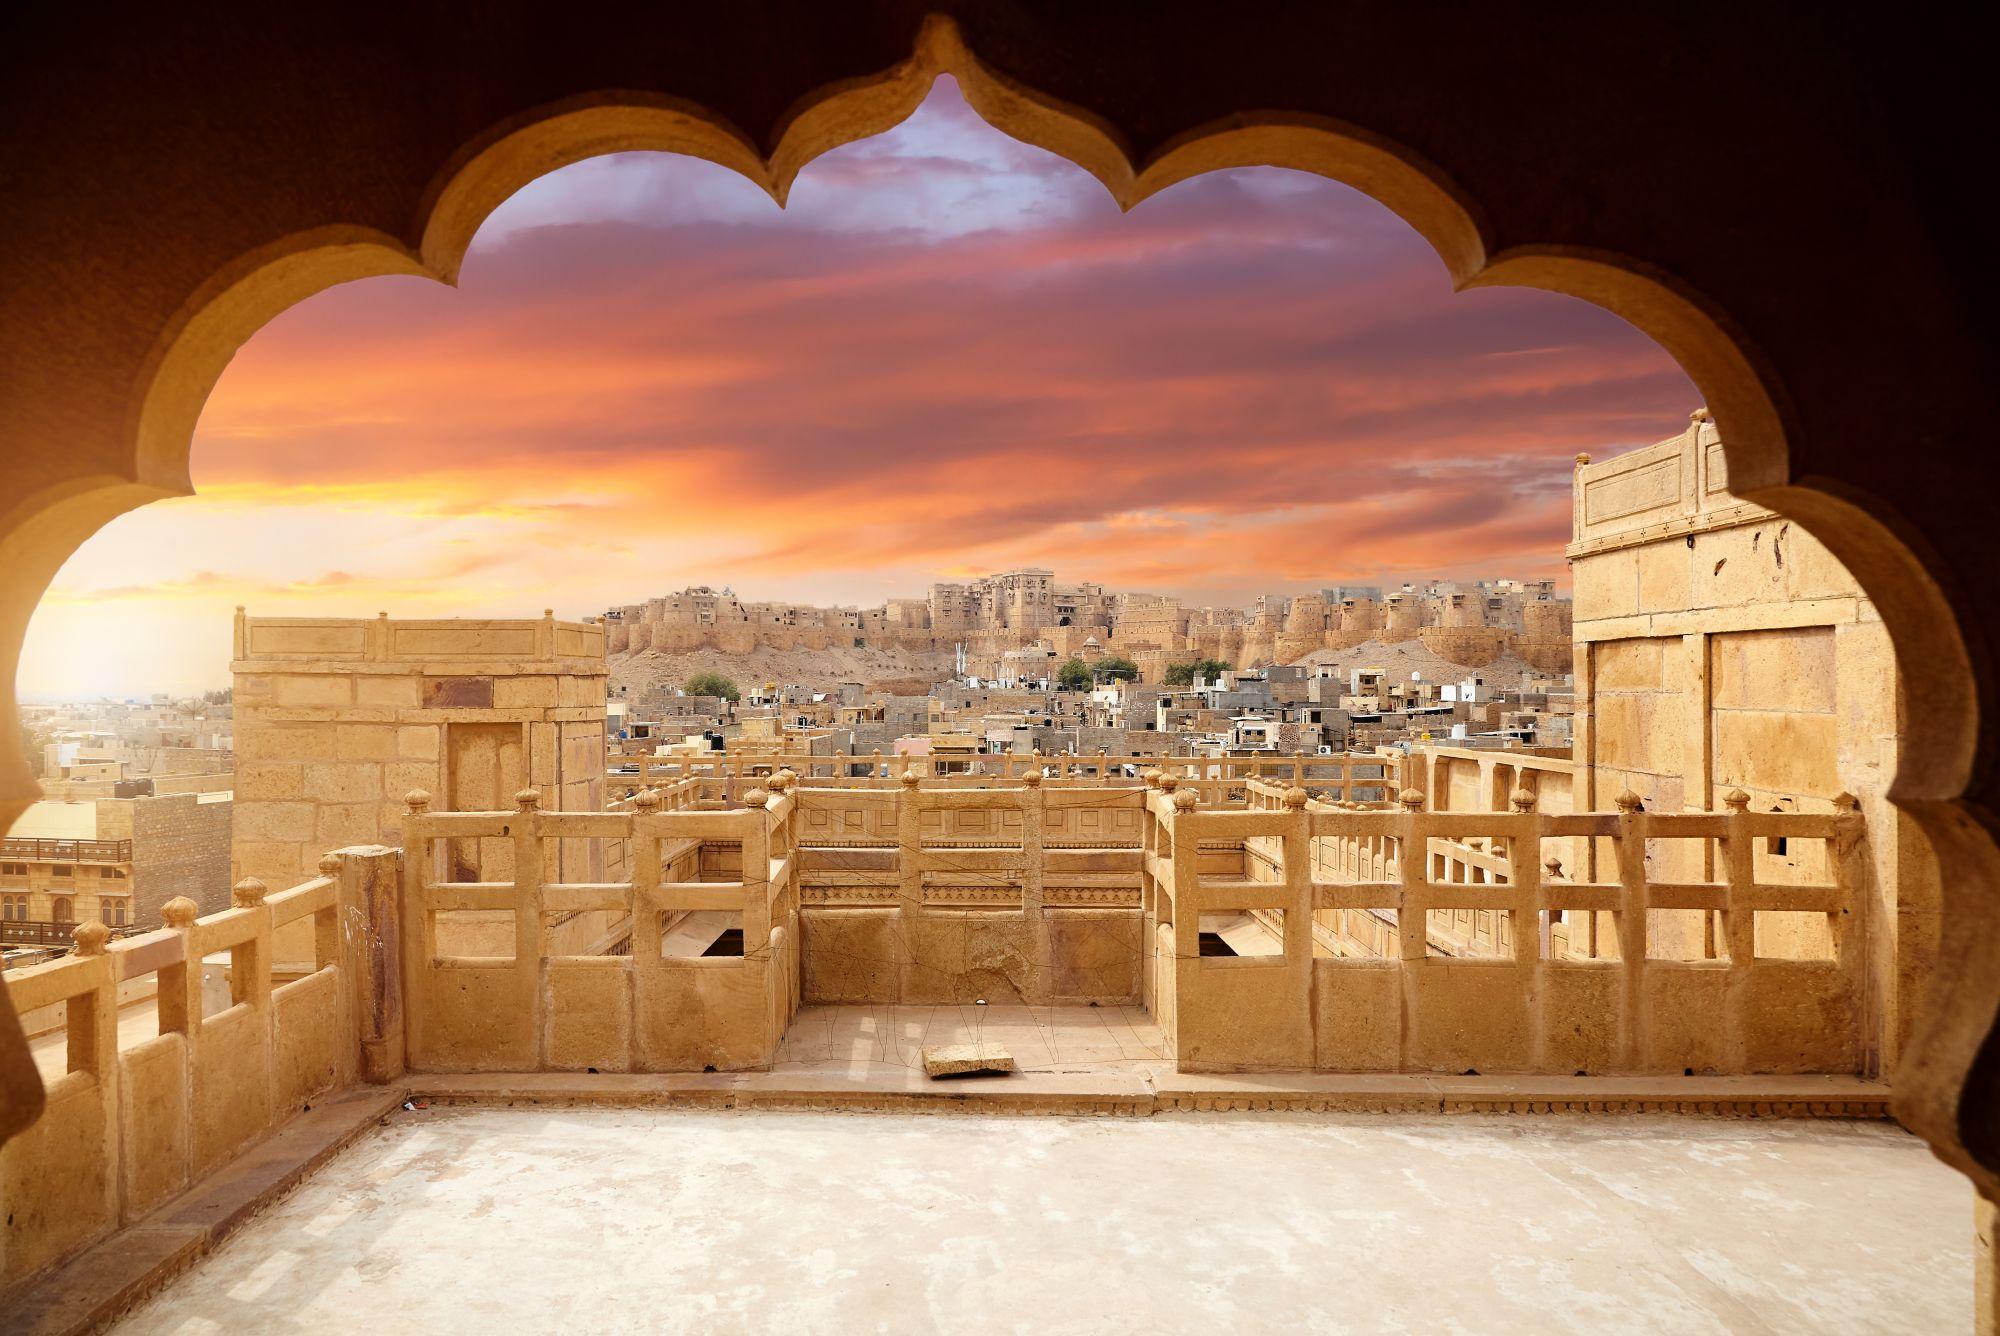 India Rajasthan Jaisalmer fort